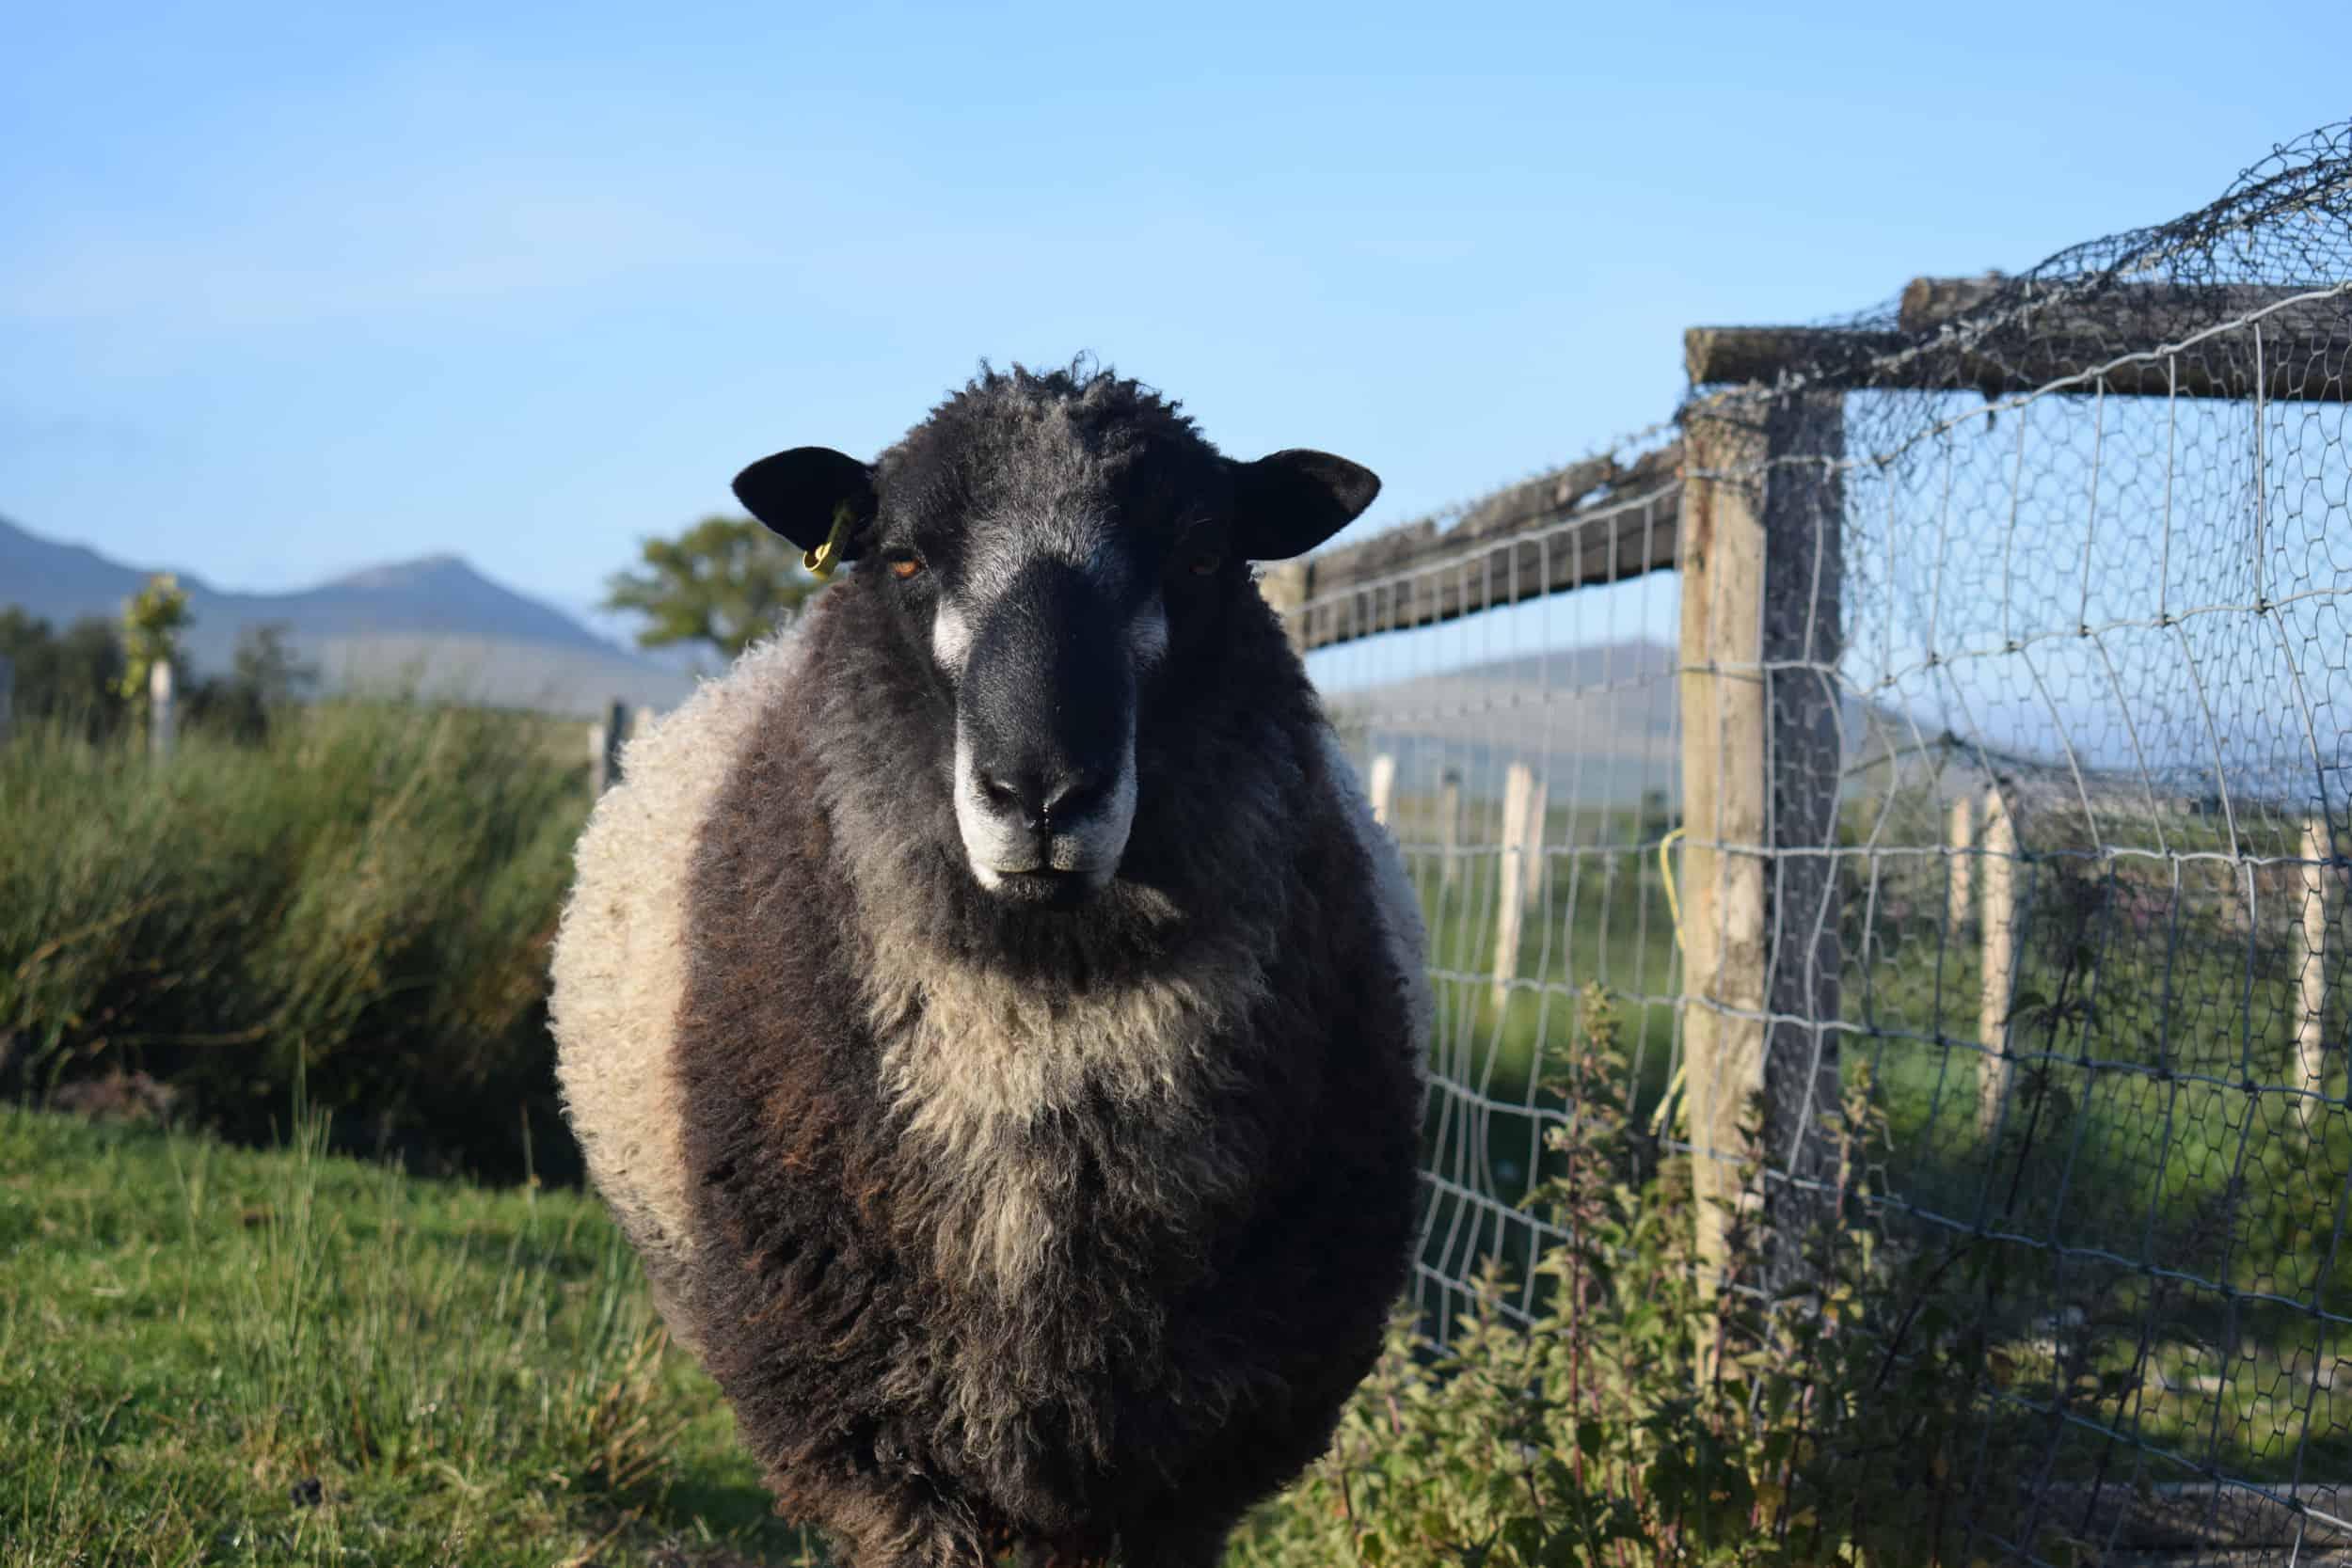 Bruno yearling ram coloured leicester longwool gotland shetland sheep crossbreed english blue kind fibre 4